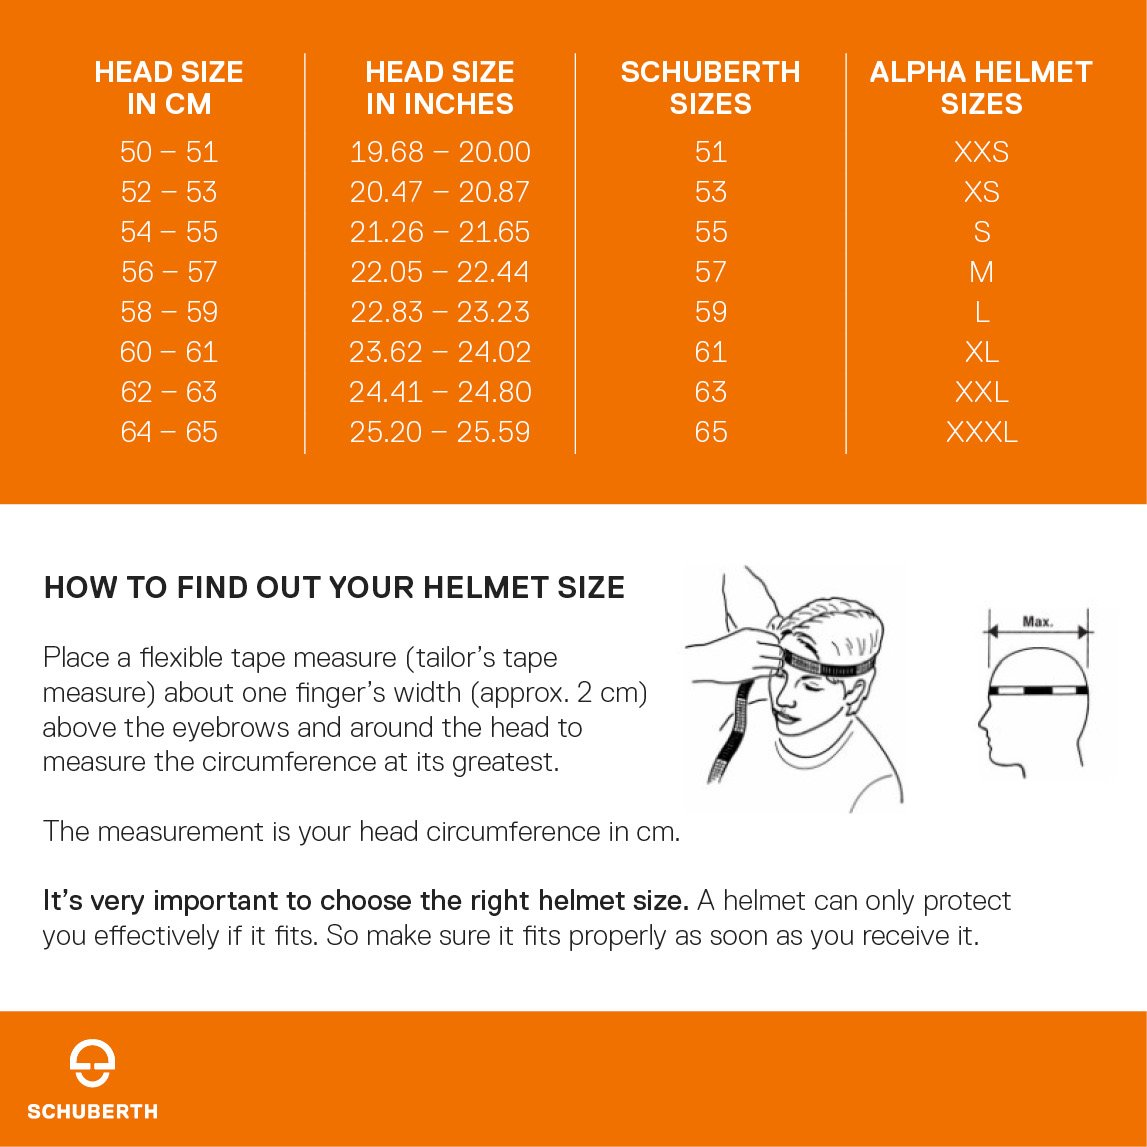 Schuberth helmet size chart